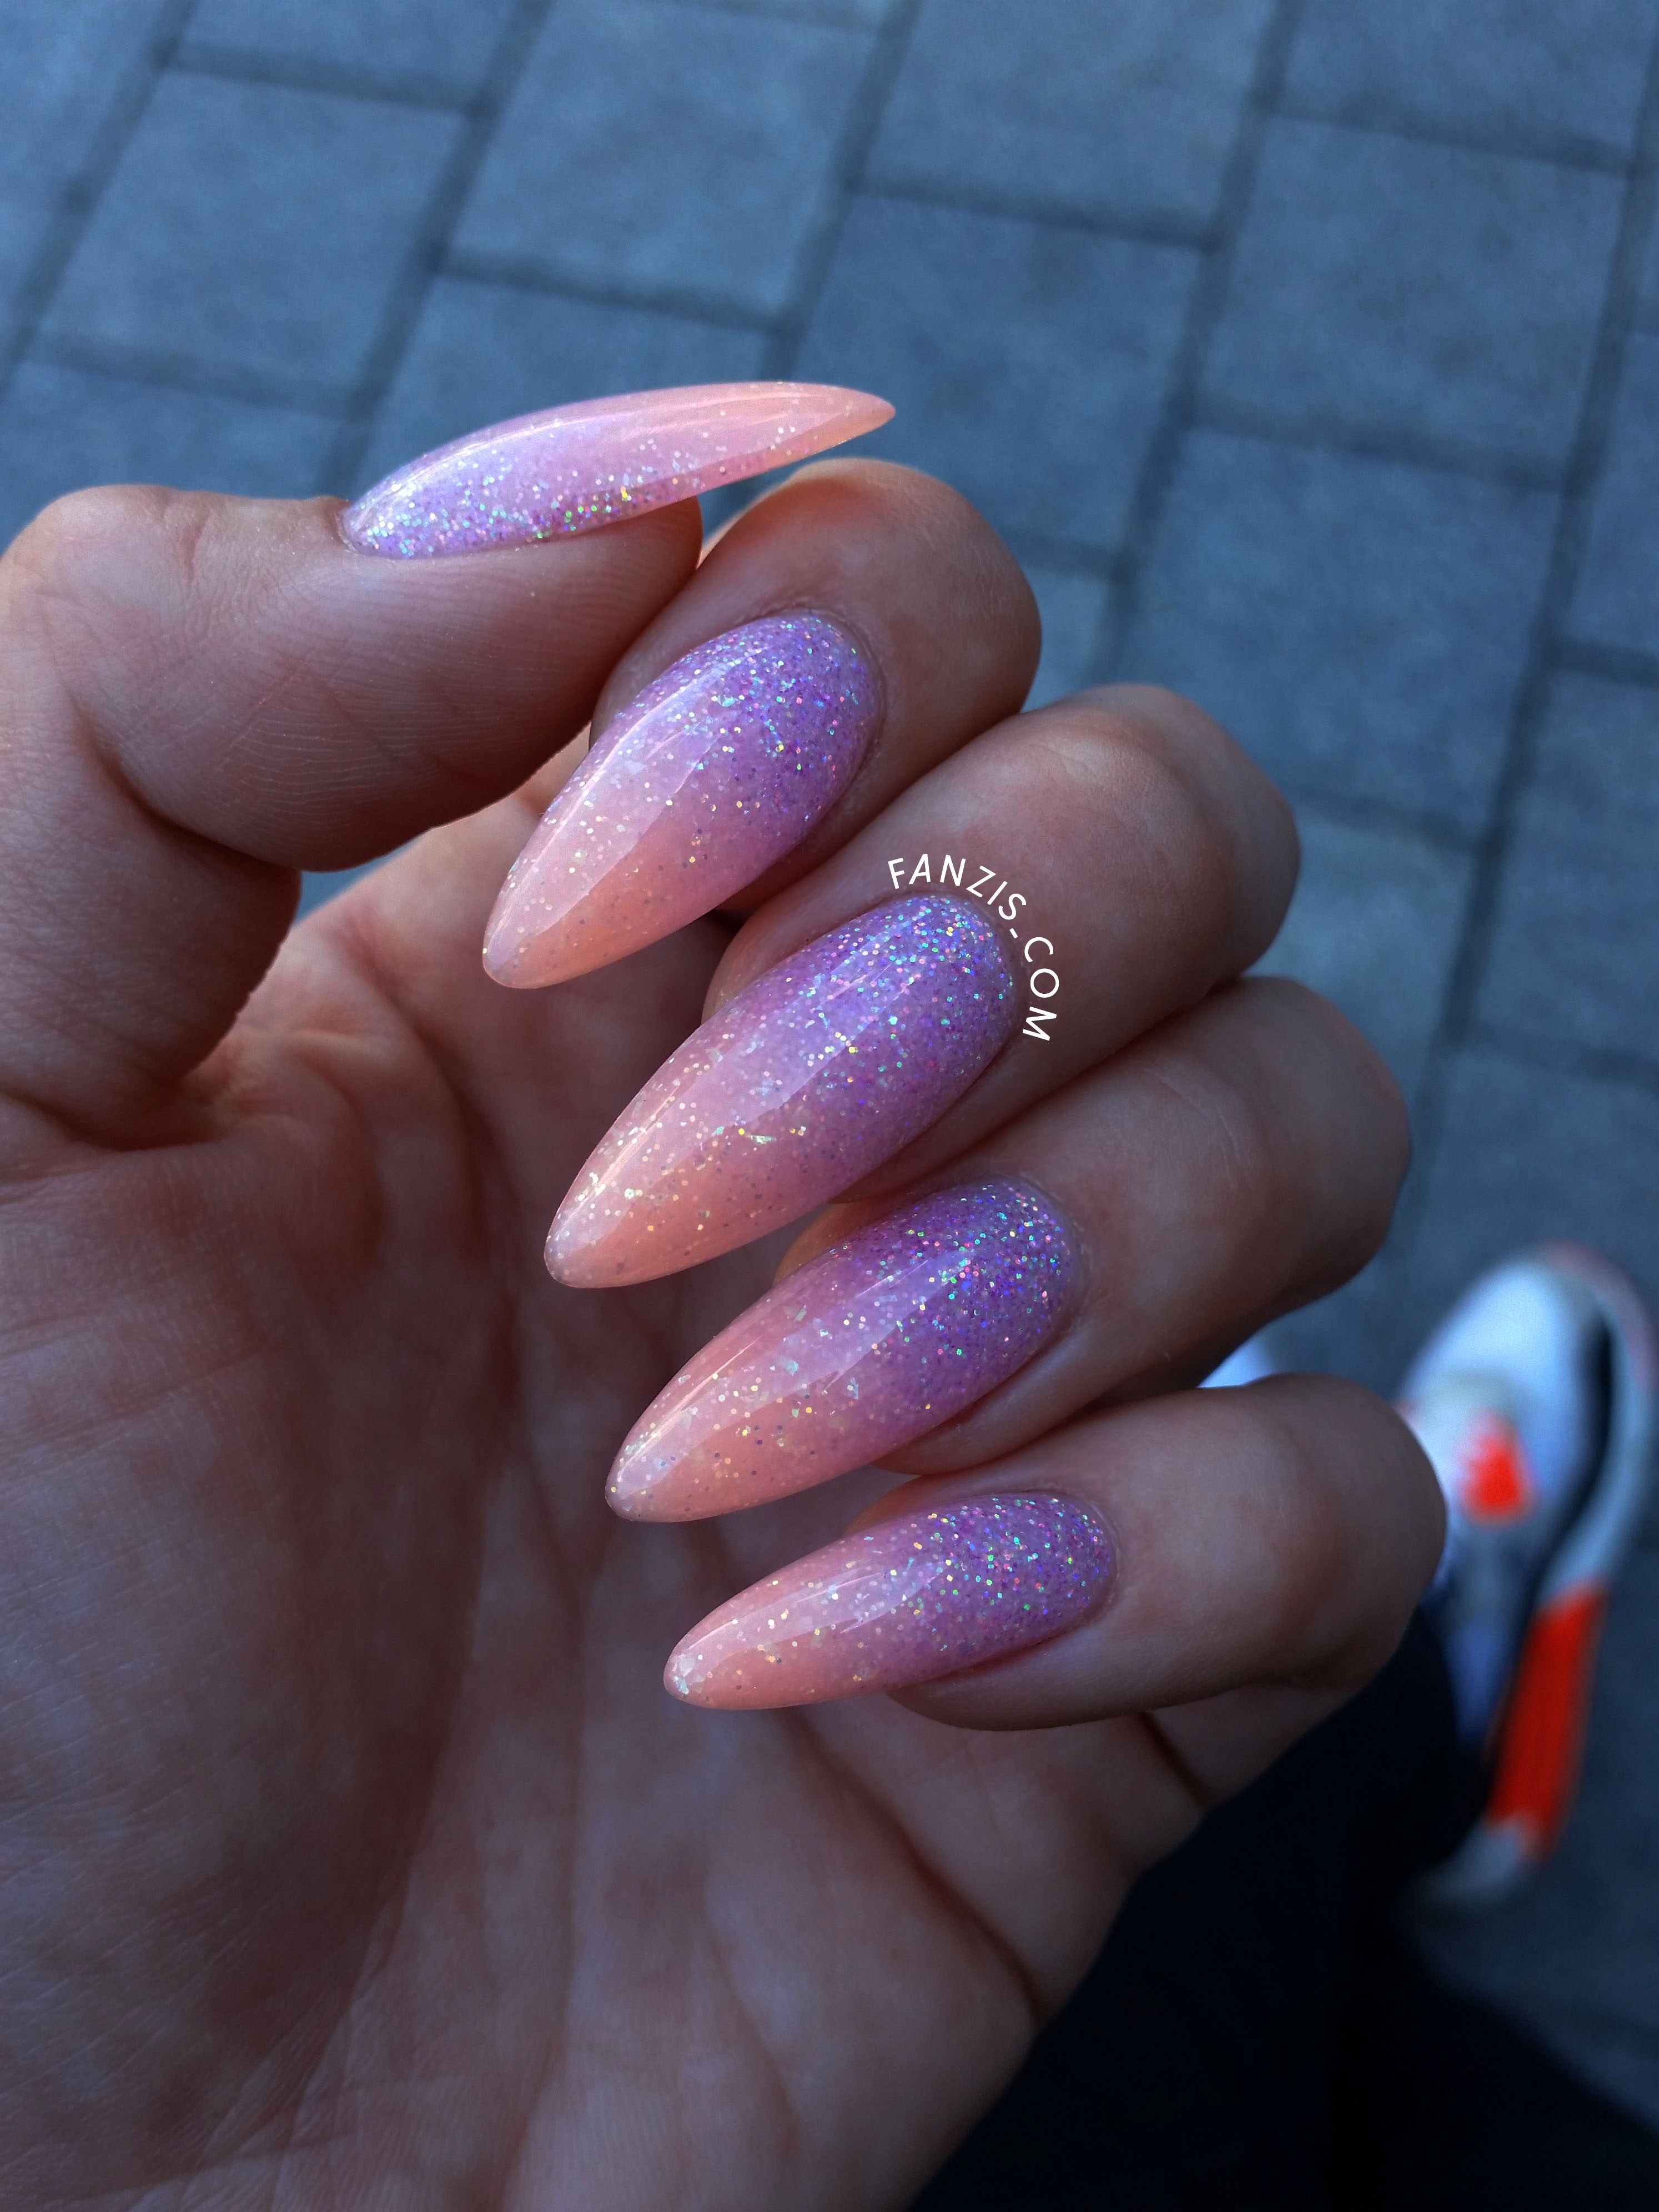 neon ombre glitter nails nails 2017 pinterest nagelschere nageldesign und fingern gel. Black Bedroom Furniture Sets. Home Design Ideas